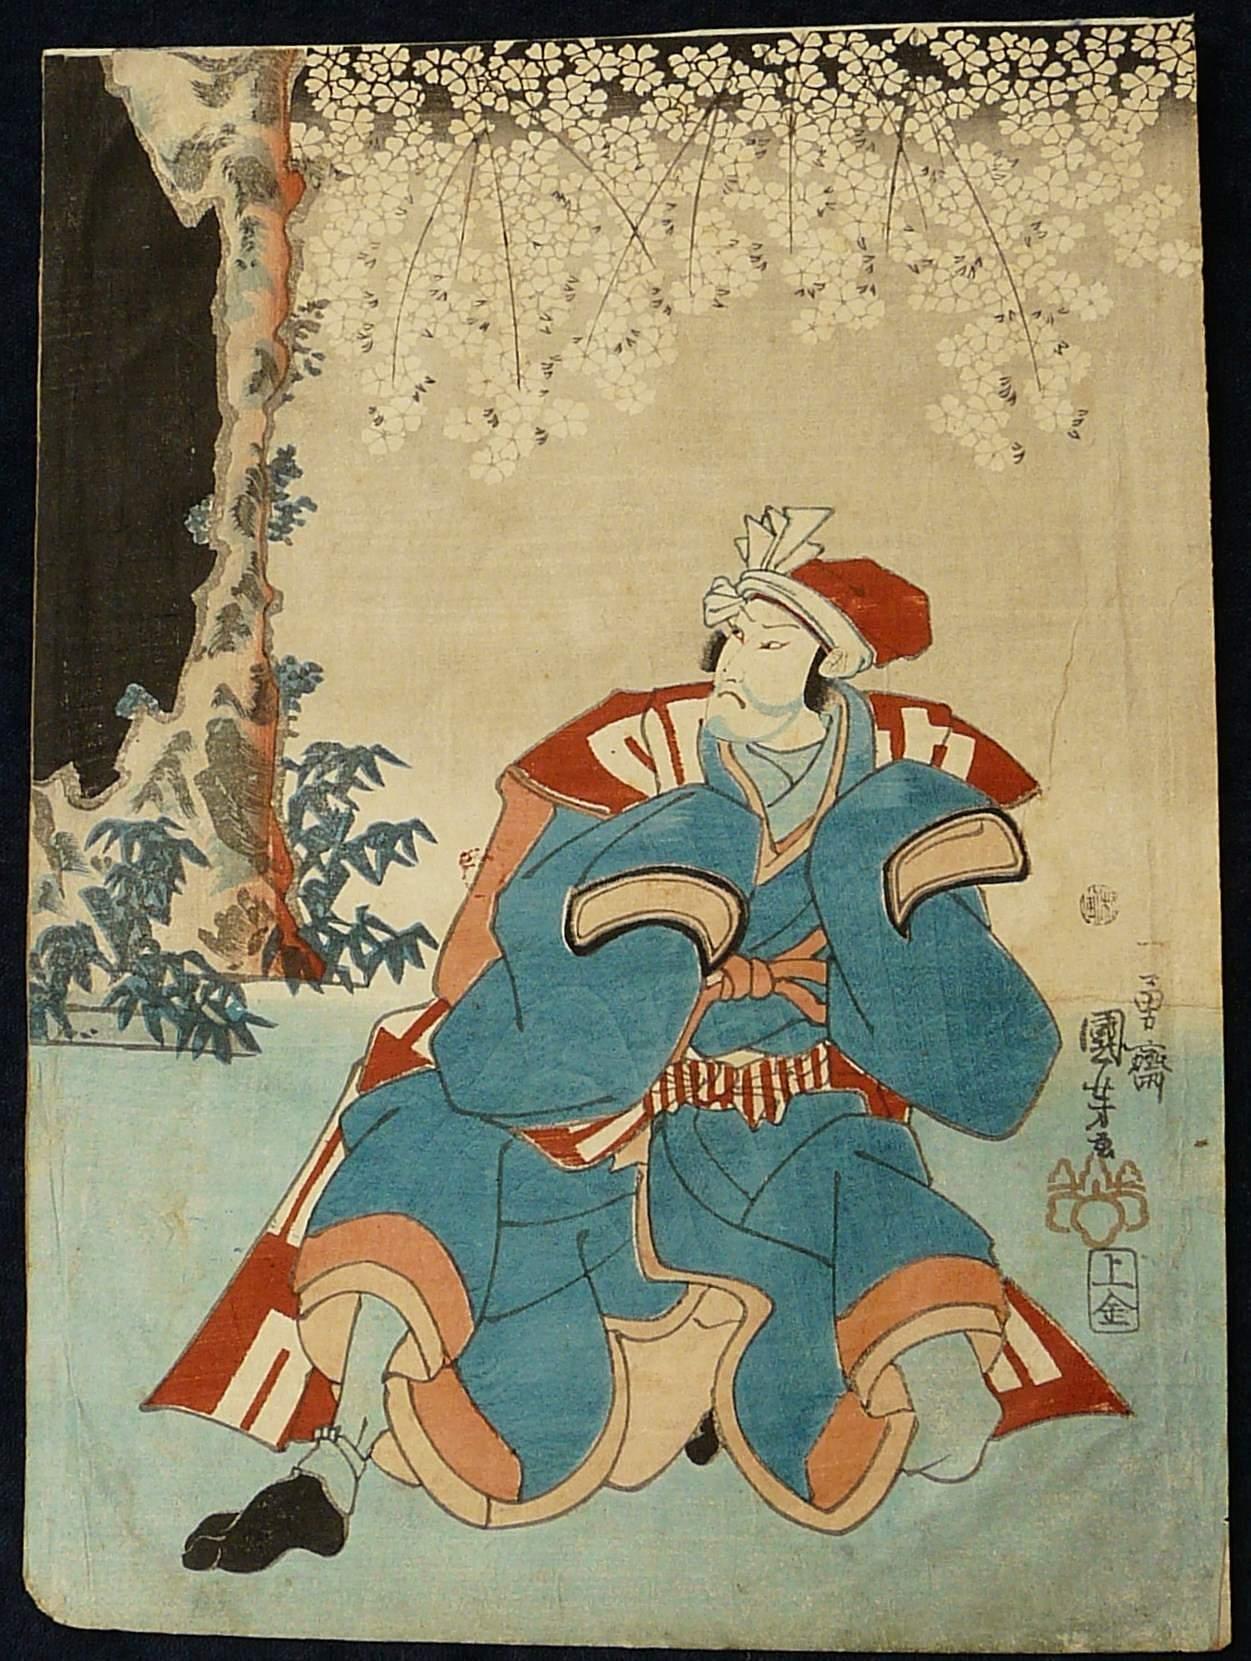 UTAGAWA KUNIYOSHI: #P3907 SAMURAI BENEATH A CHERRY TREE 1860